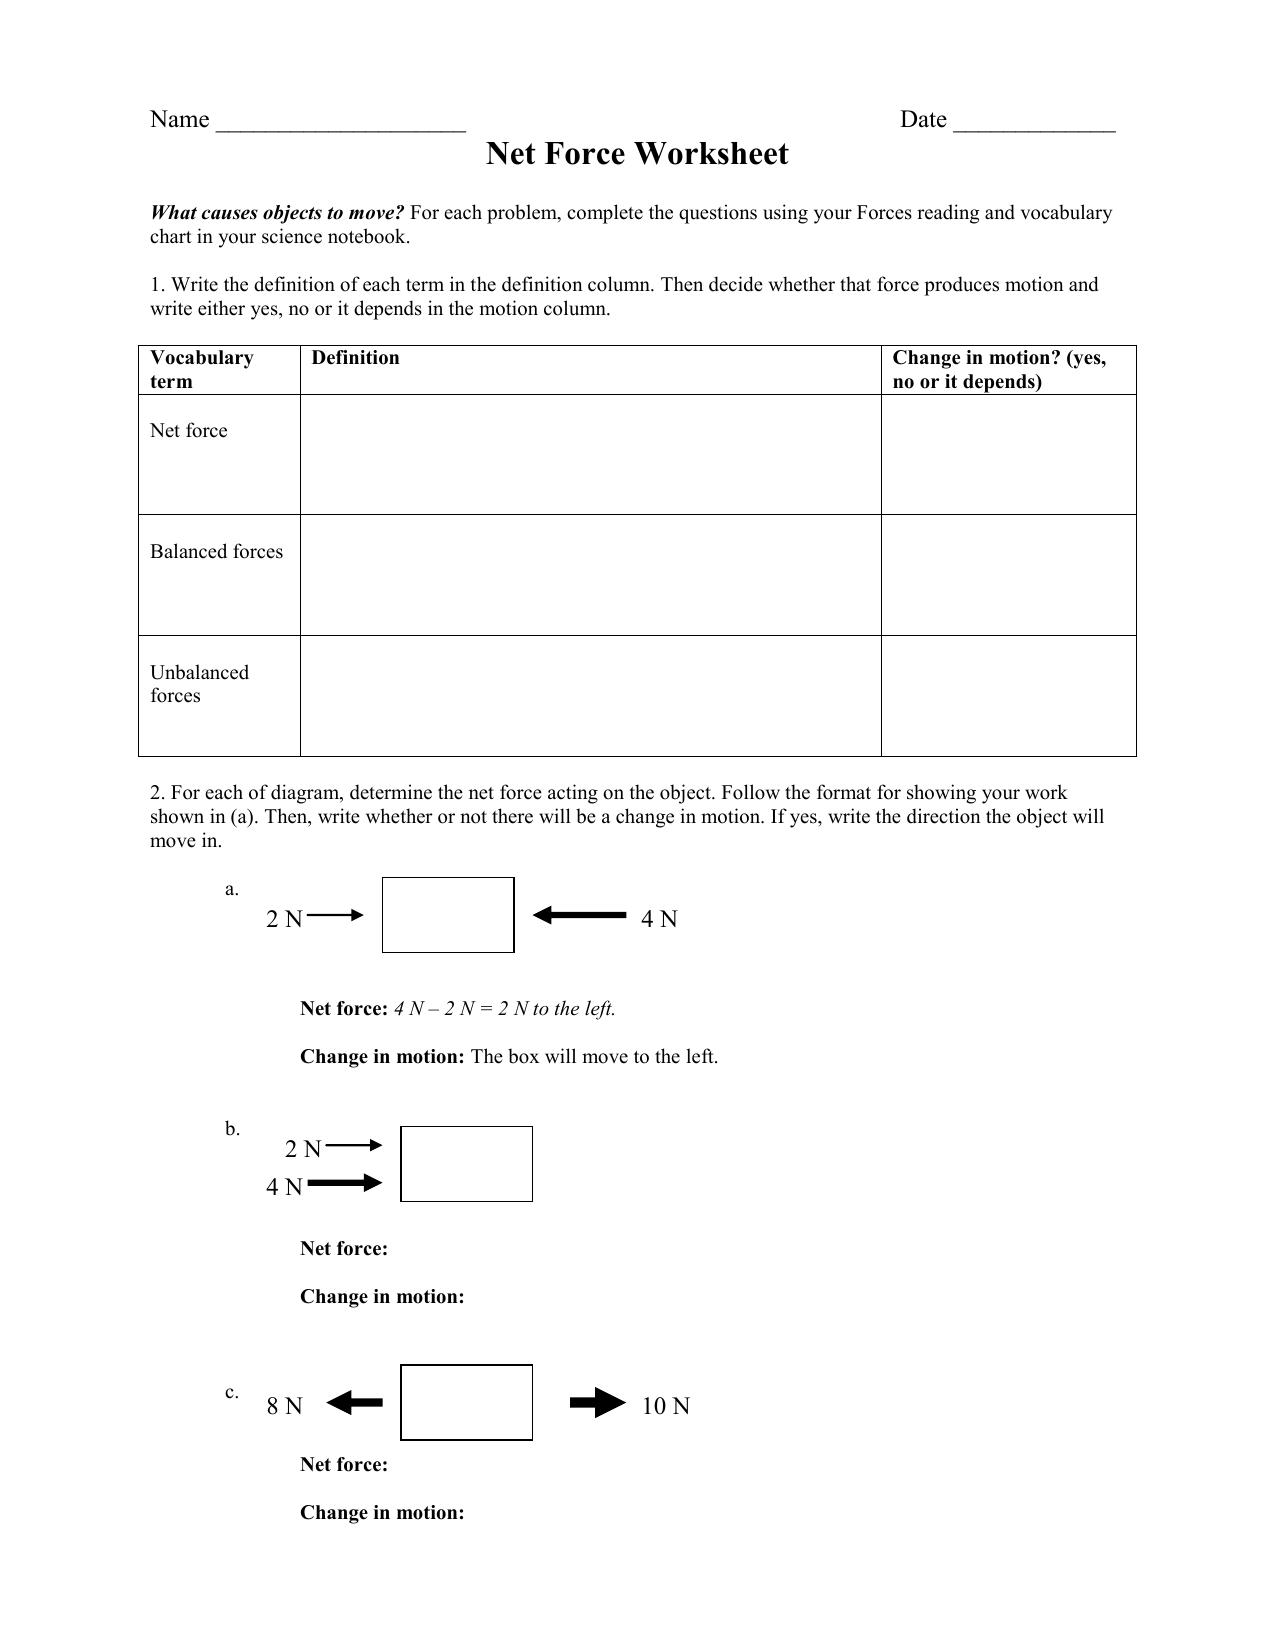 Net Force Worksheet Crjh 8th Grade Science